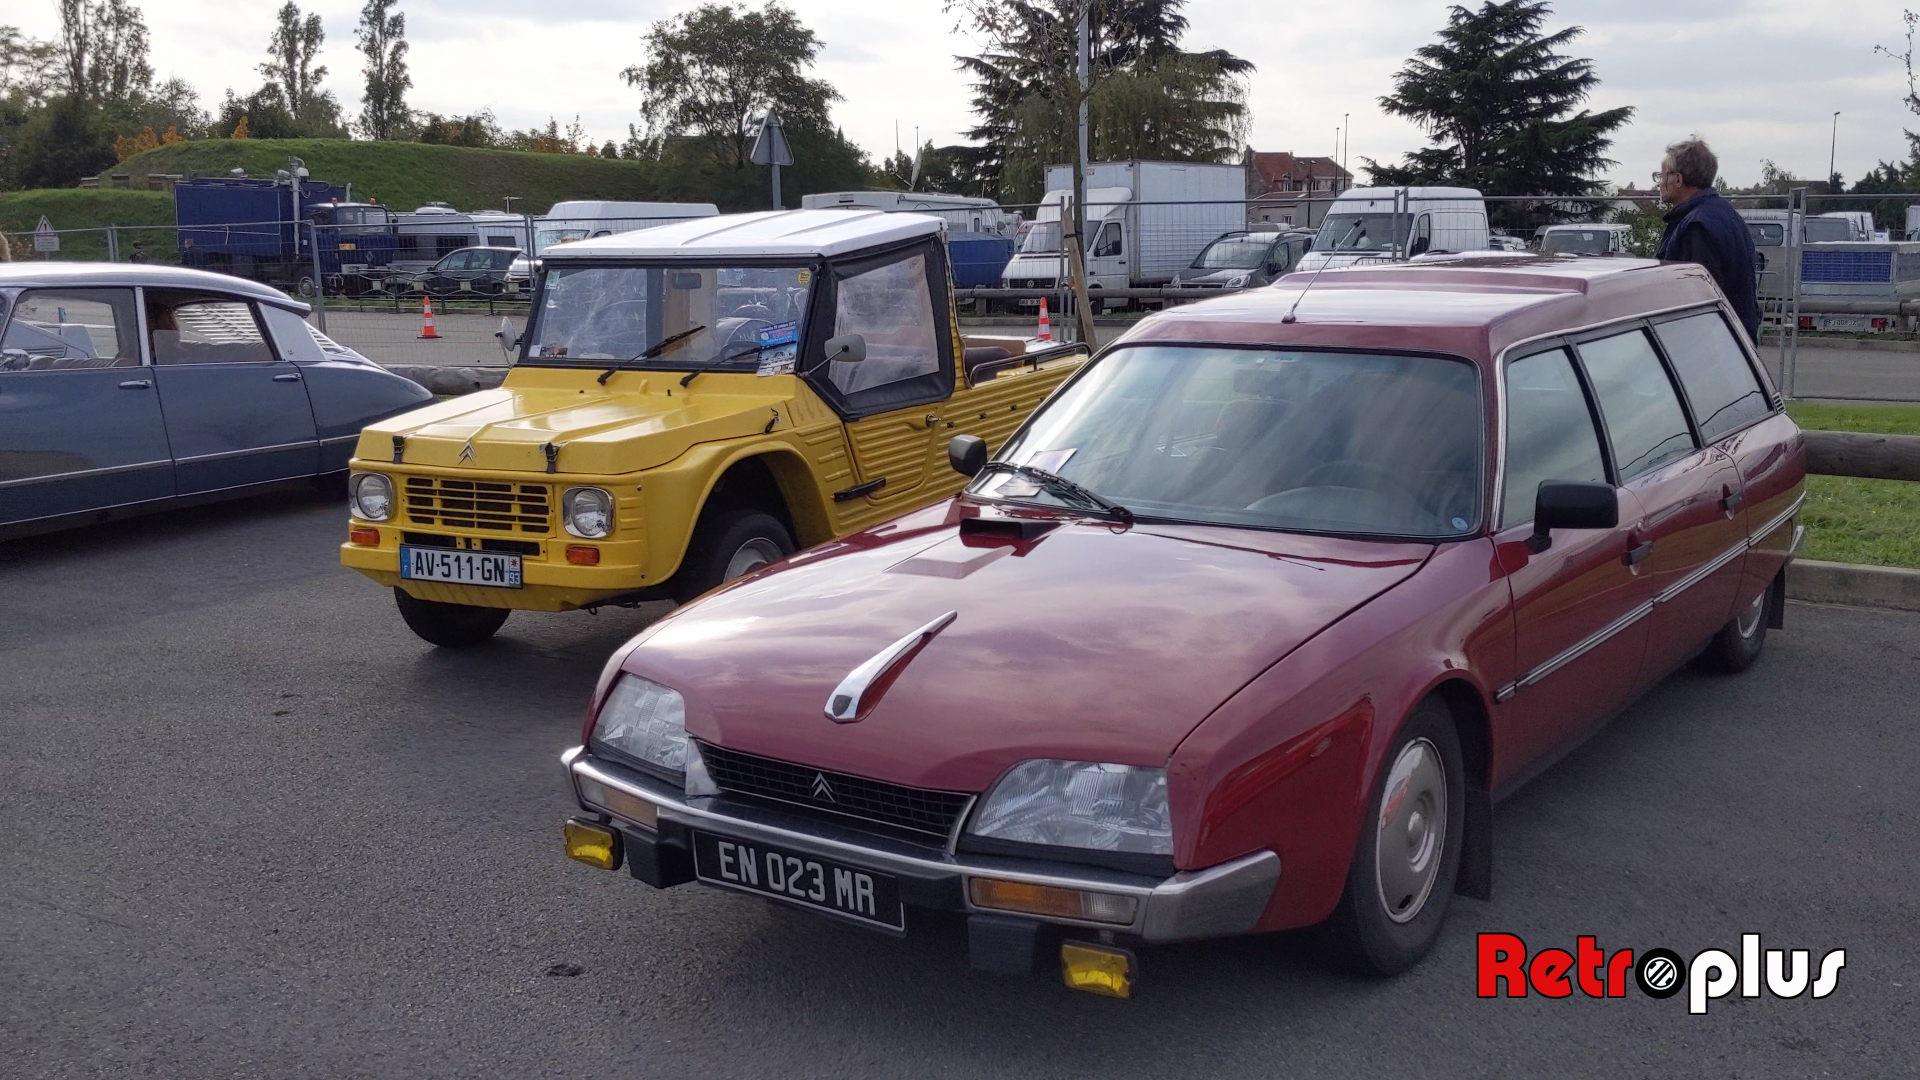 Automedon2019-parkingCitroen12